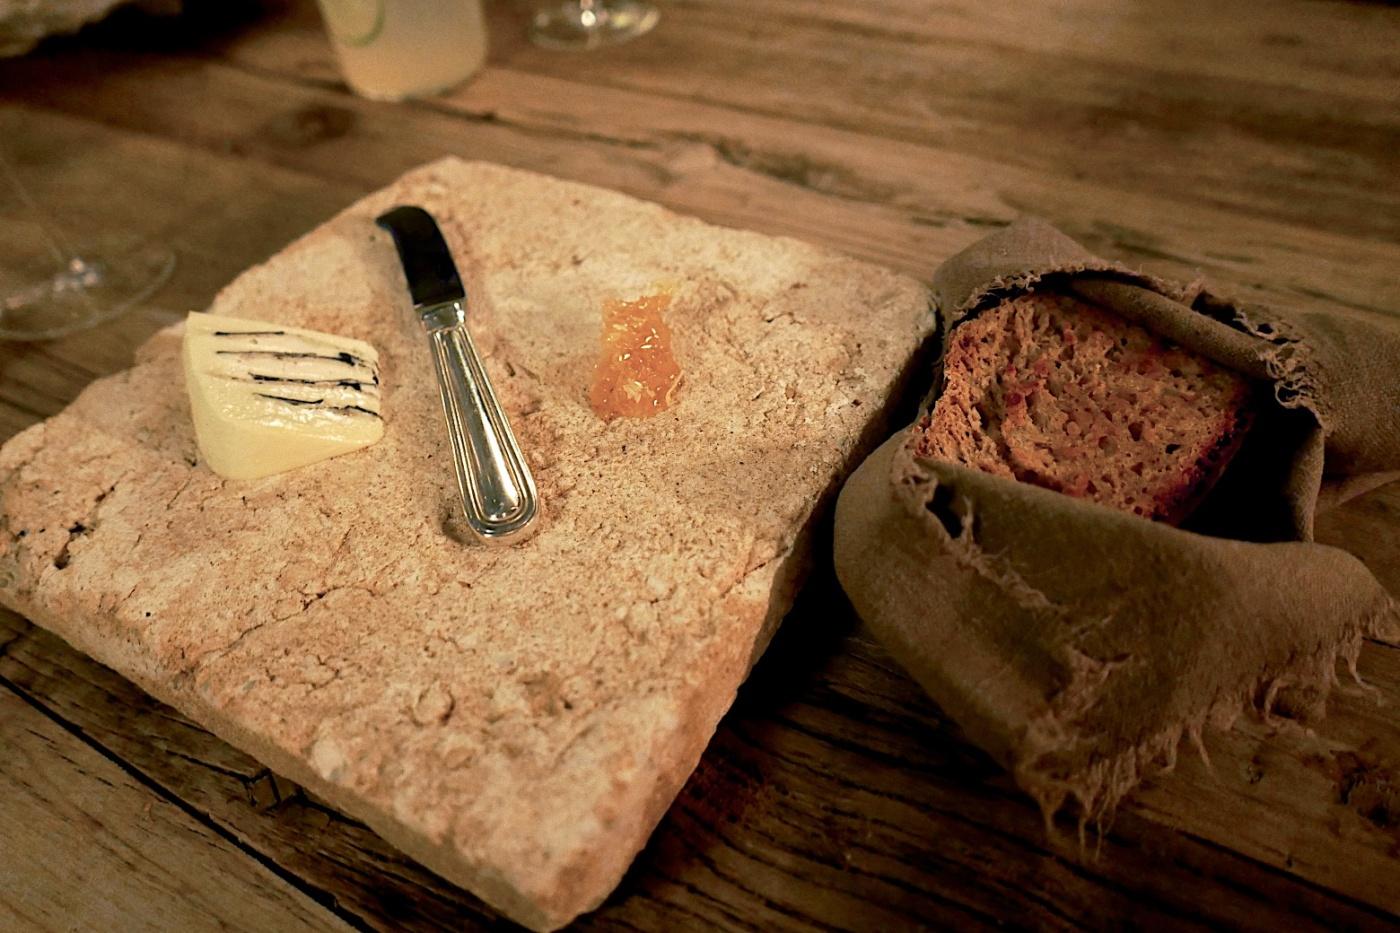 Truffle butter, marmalade, bread